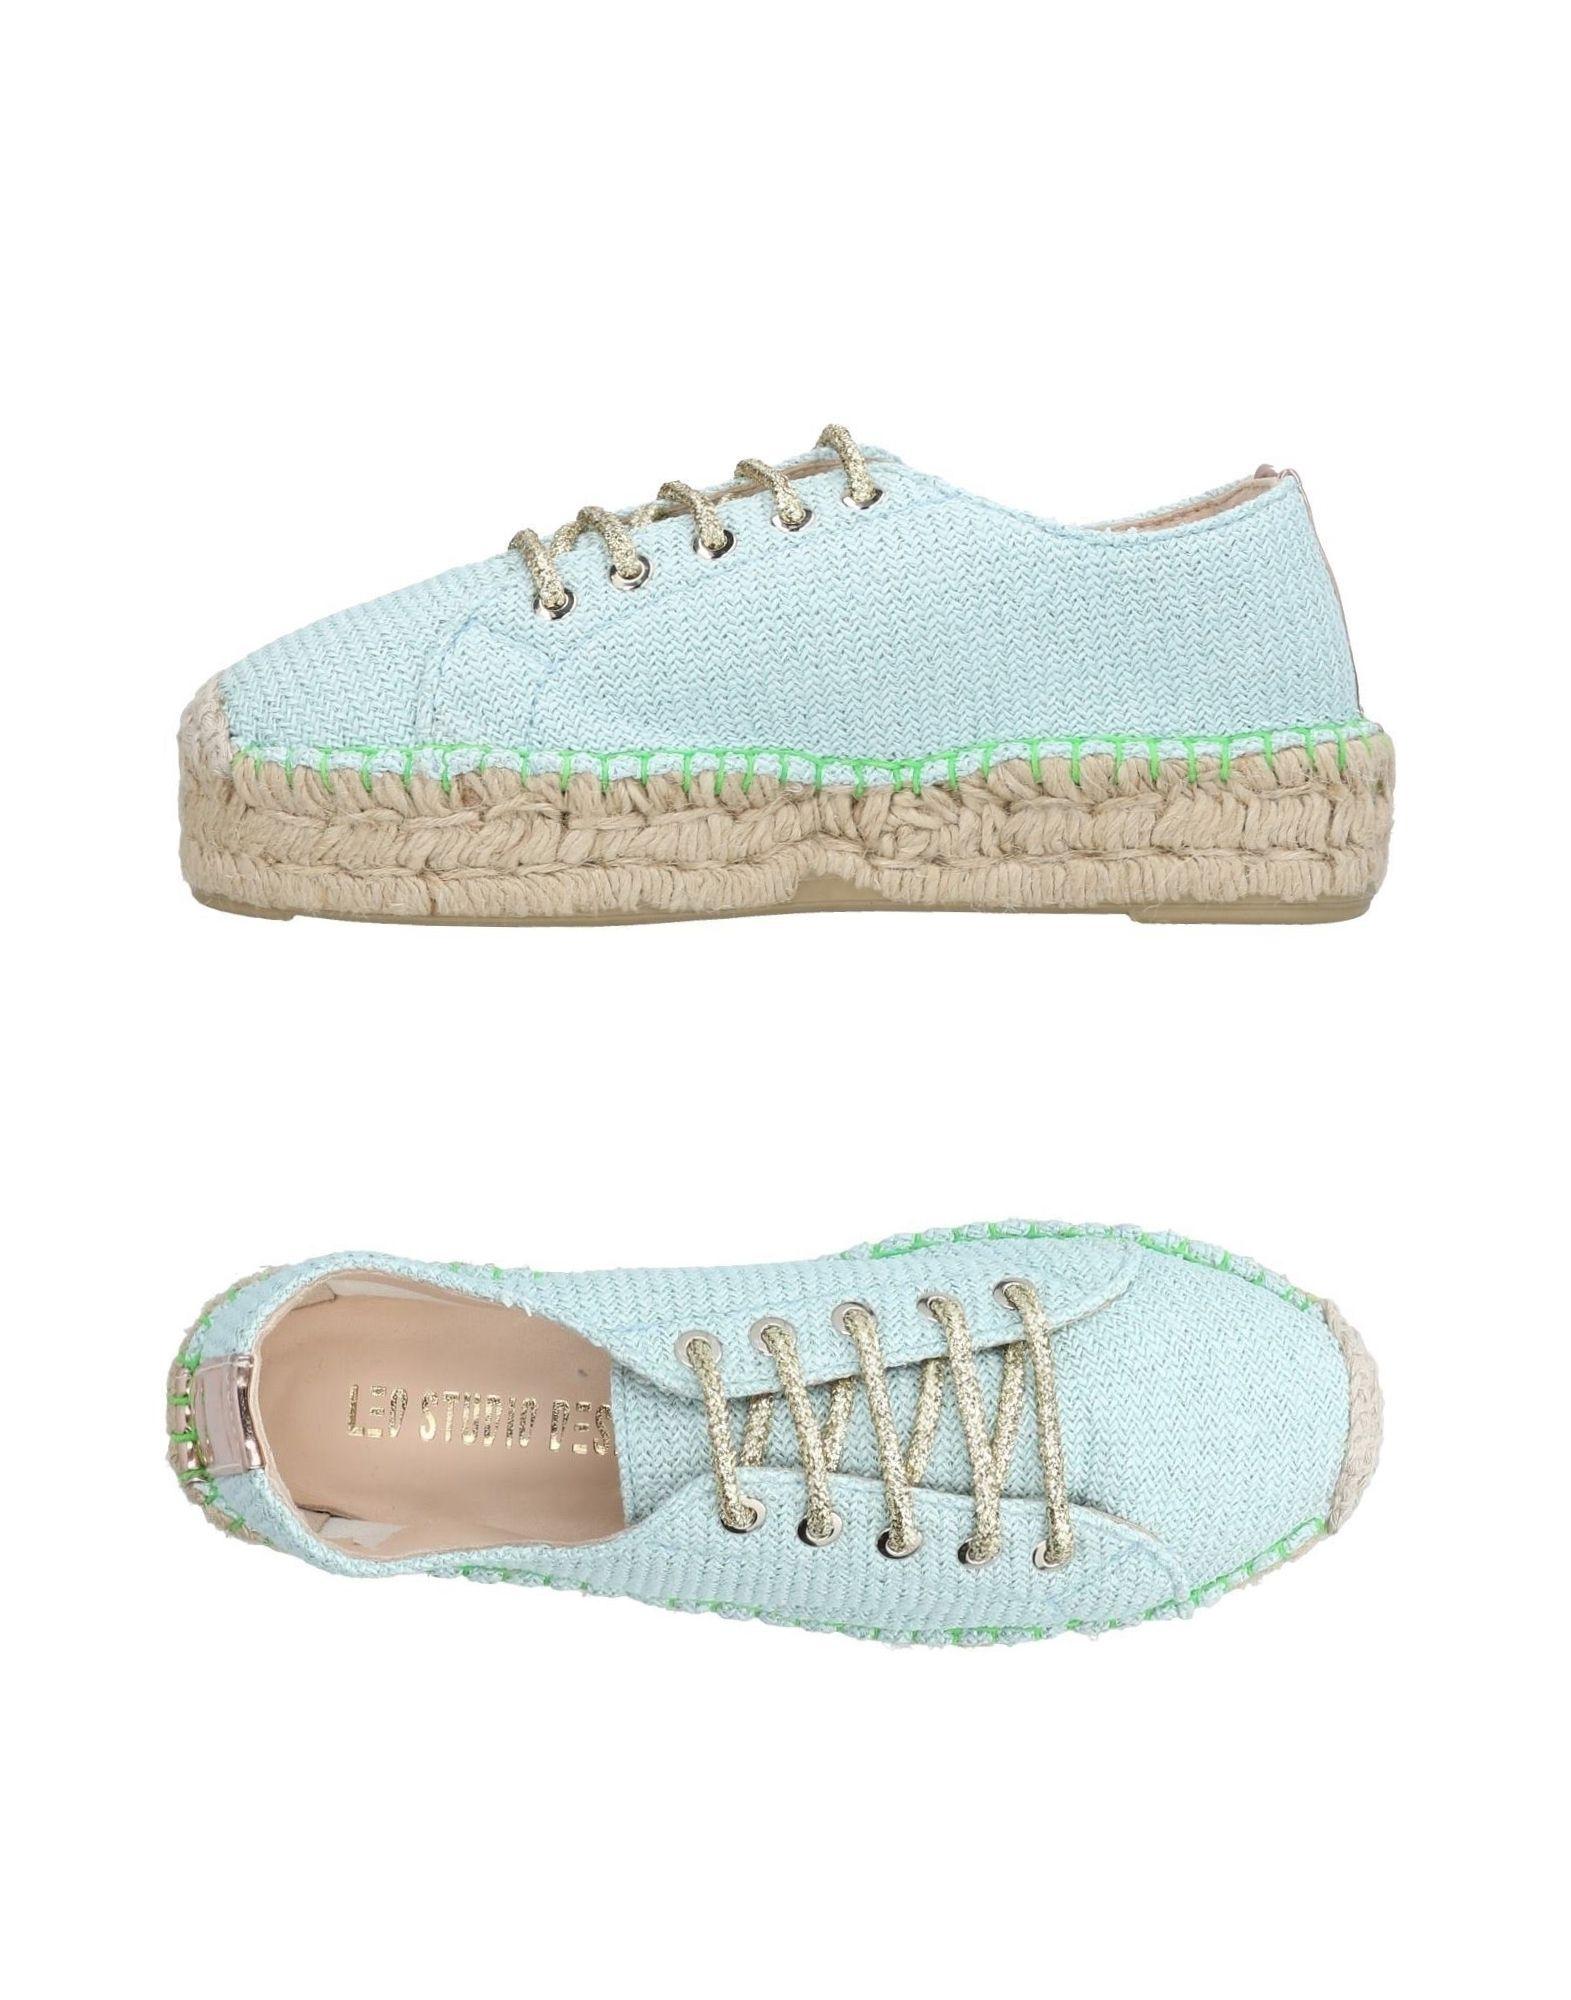 Leo Studio Design Sneakers Damen  11442749GX Gute Qualität beliebte Schuhe